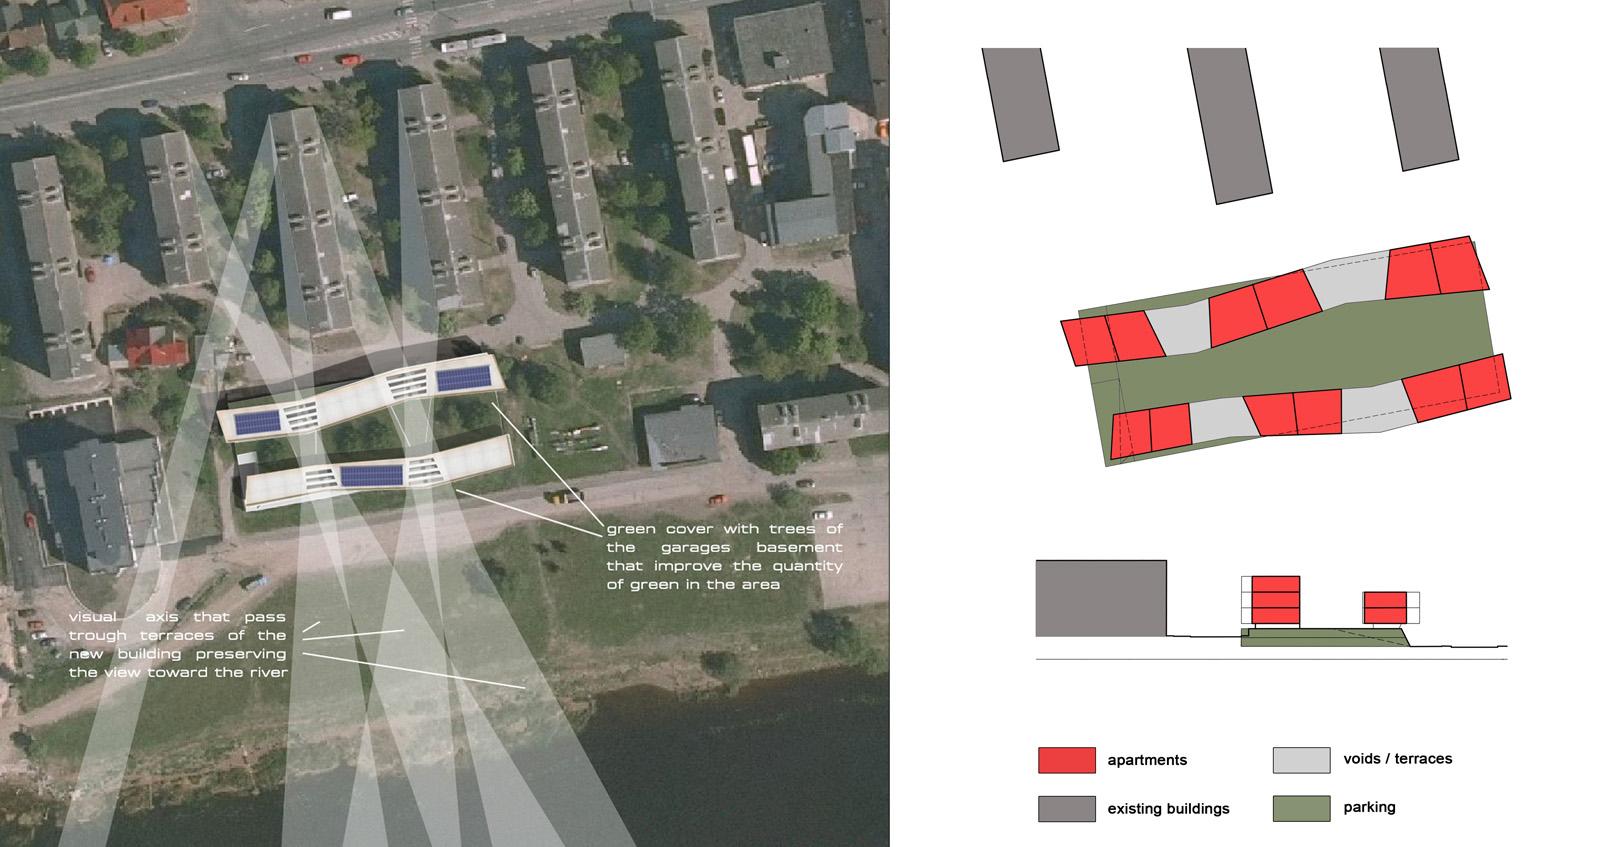 2631f7c1219 Residential and parking building - Pärnu, Estonia 2007   FDLA